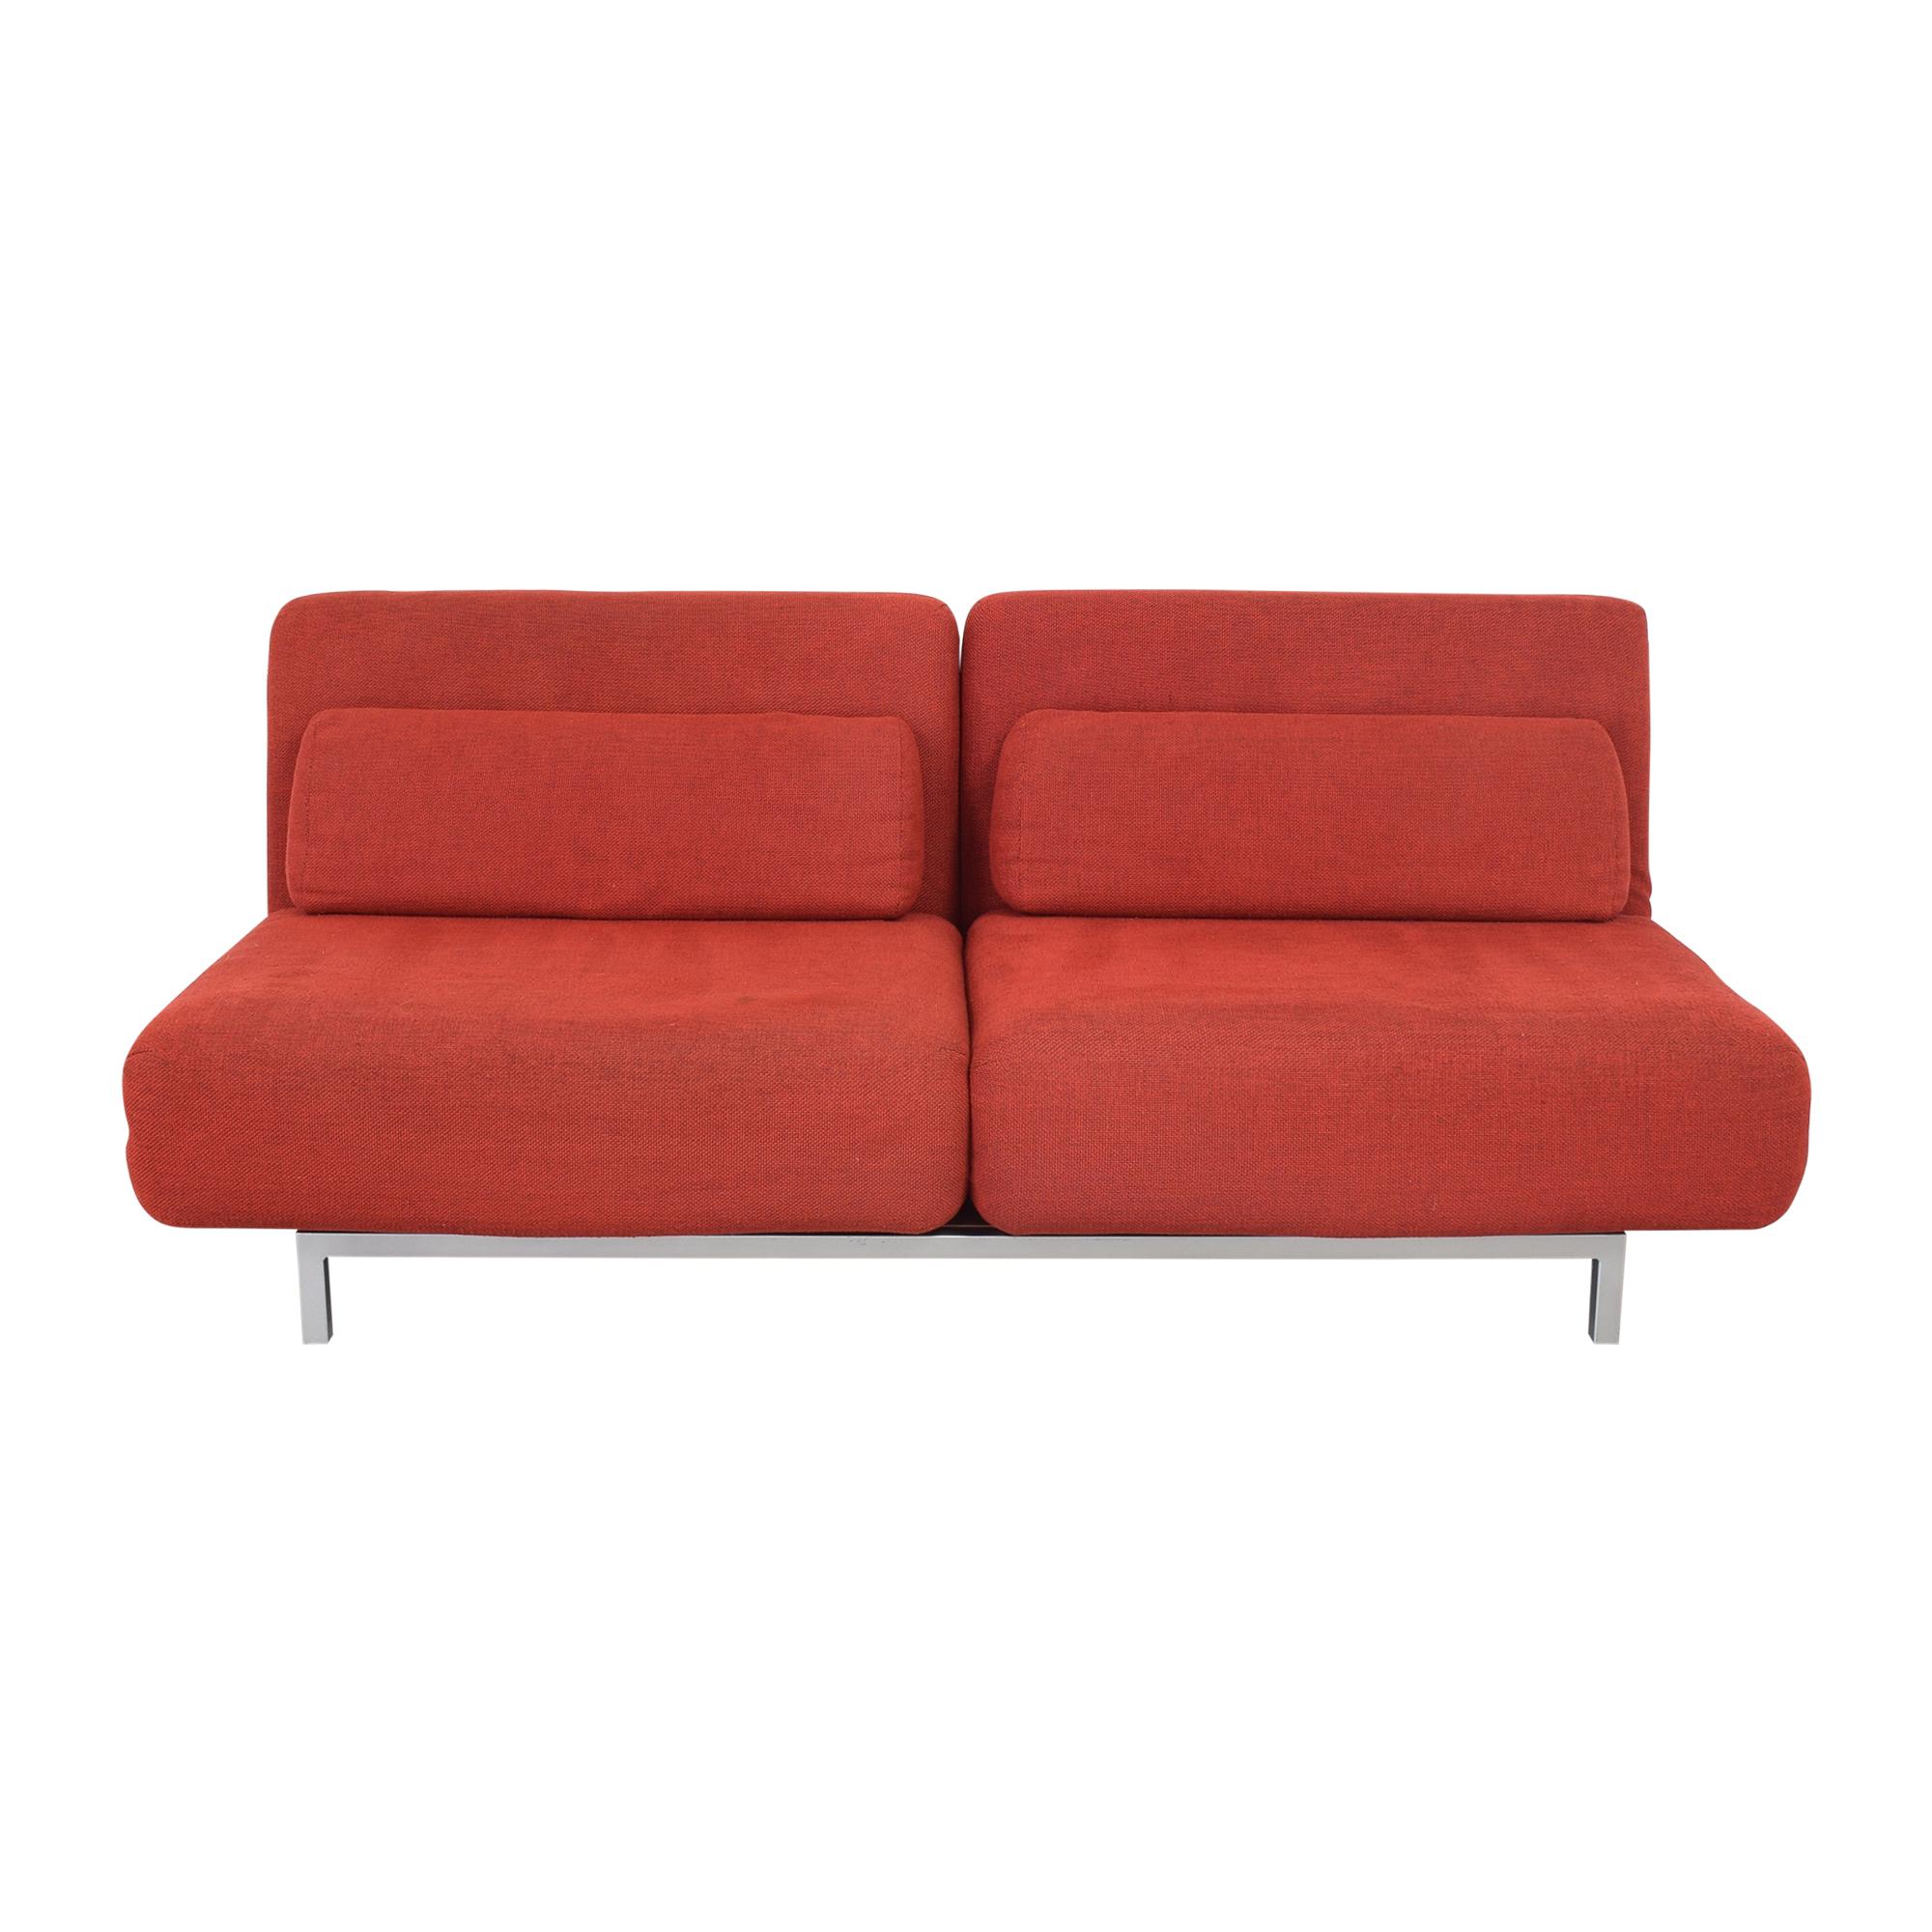 IDO IDO Swivel Convertible Sofa Bed second hand